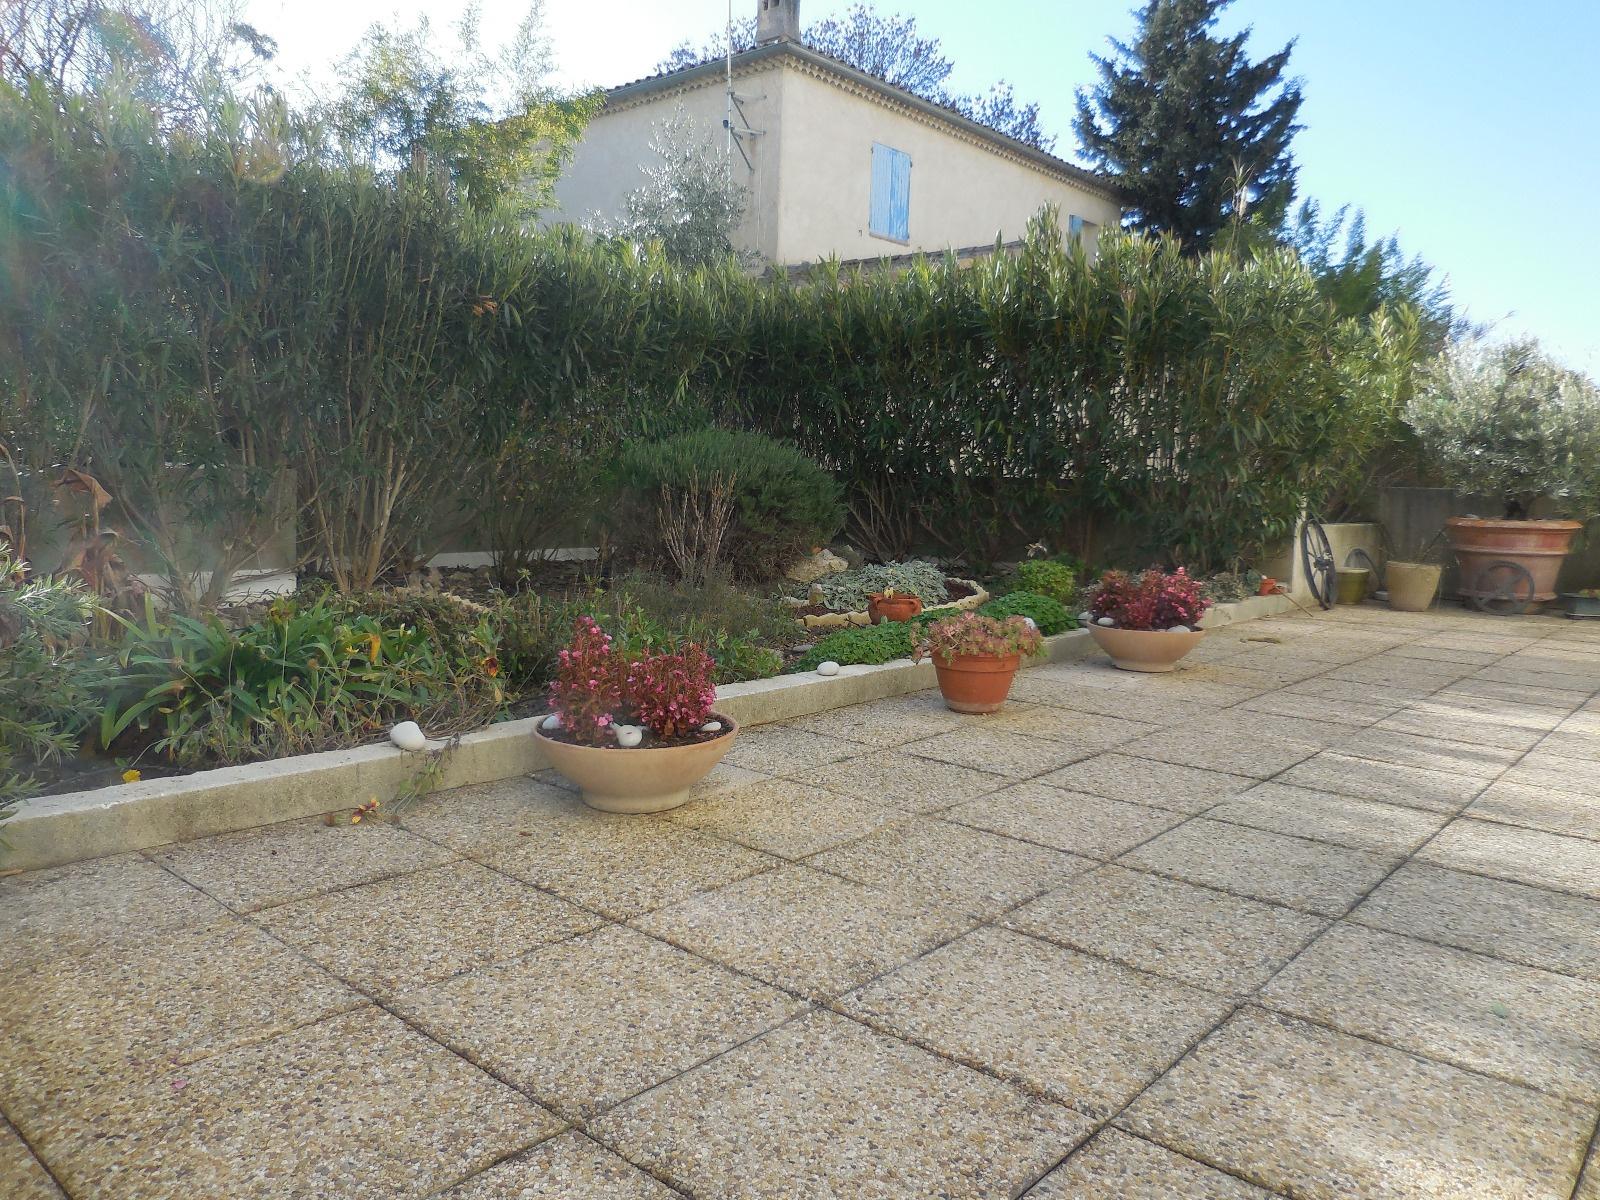 Vente appartement de t3 avec grande terrasse jardin azur for Terrasse jardin immobilier